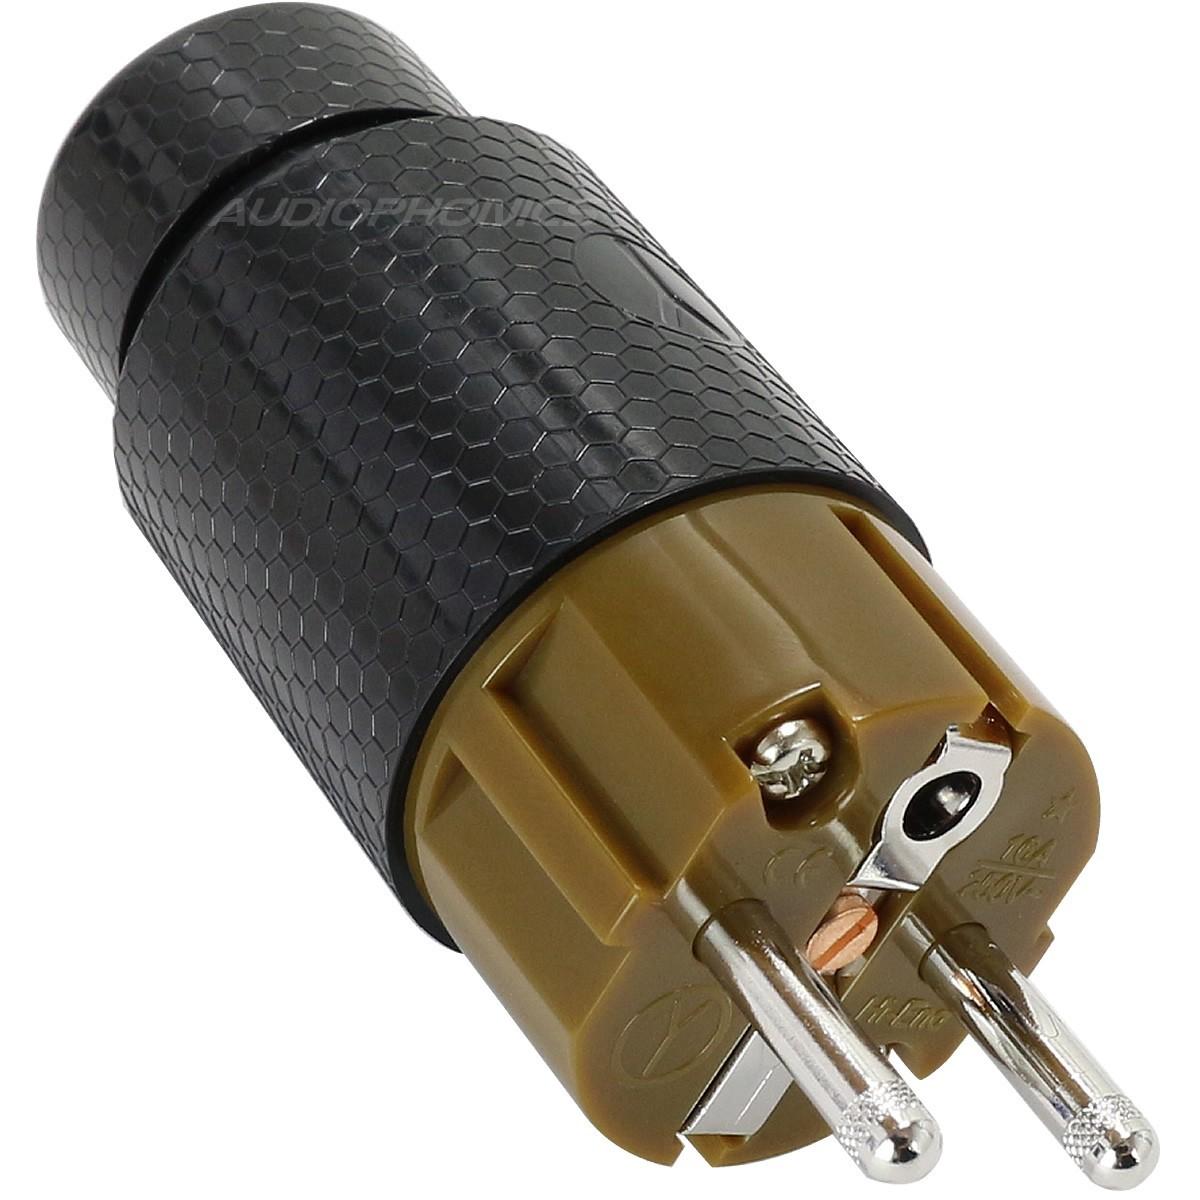 YARBO GY-901FP-R Connecteur Secteur Schuko Rhodium Ø 12.5mm